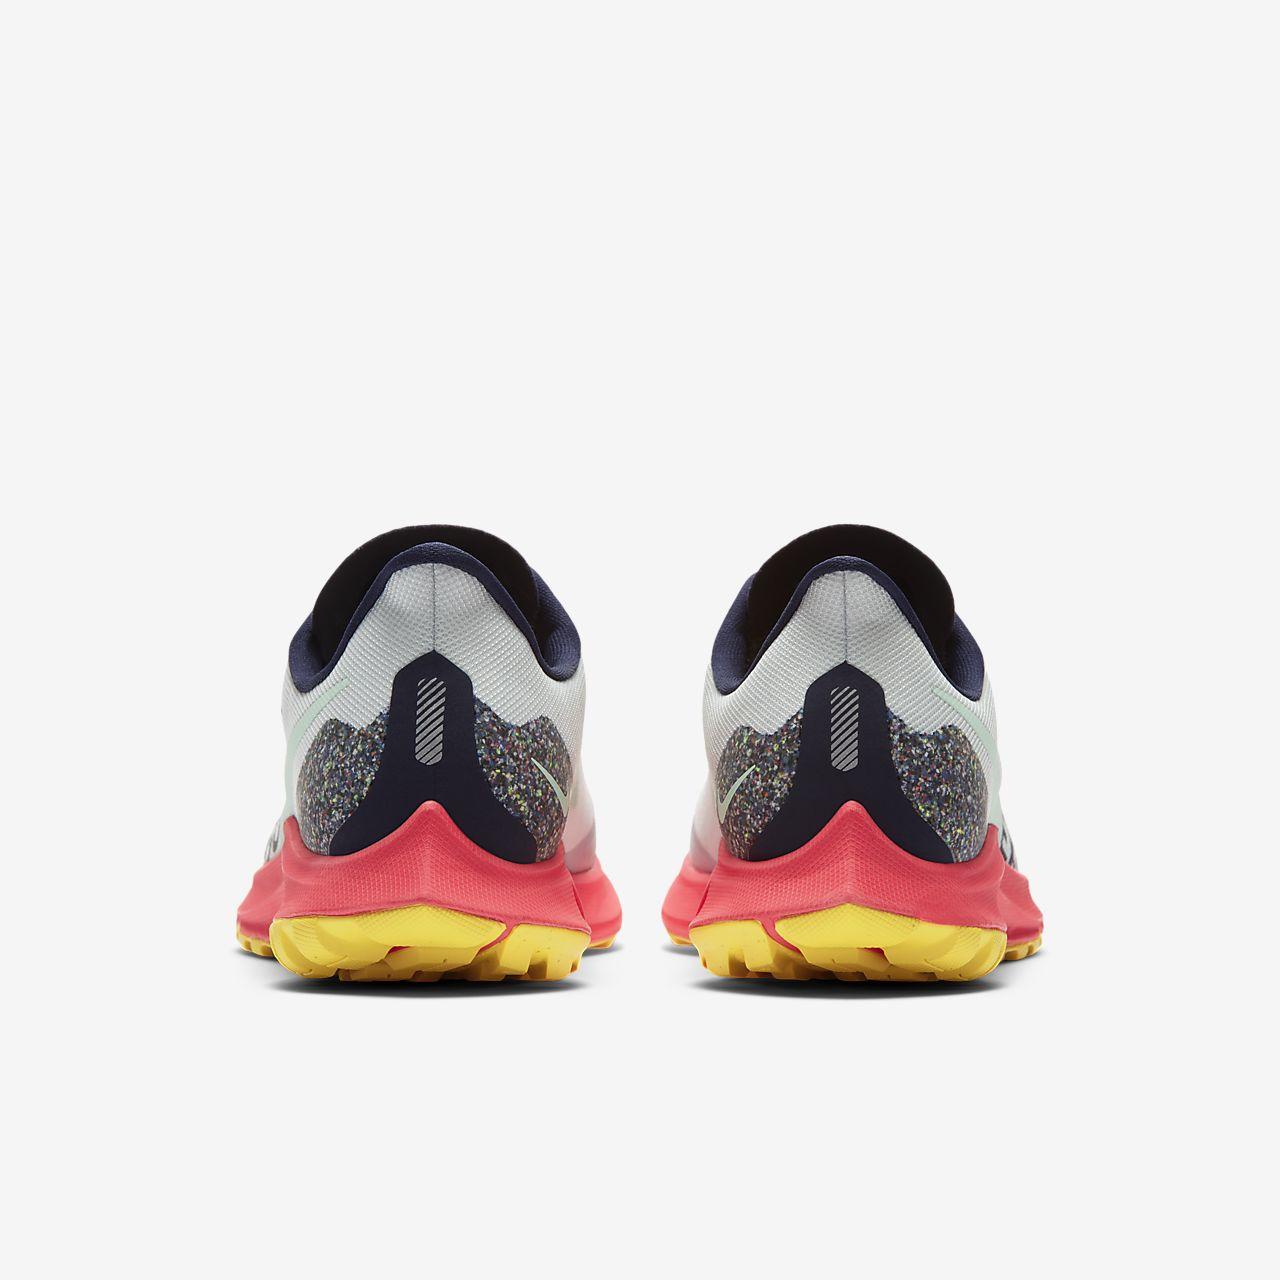 Nike W Zoom Pegasus 36 Trail GTX Chaussures de Running Comp/étition Femme